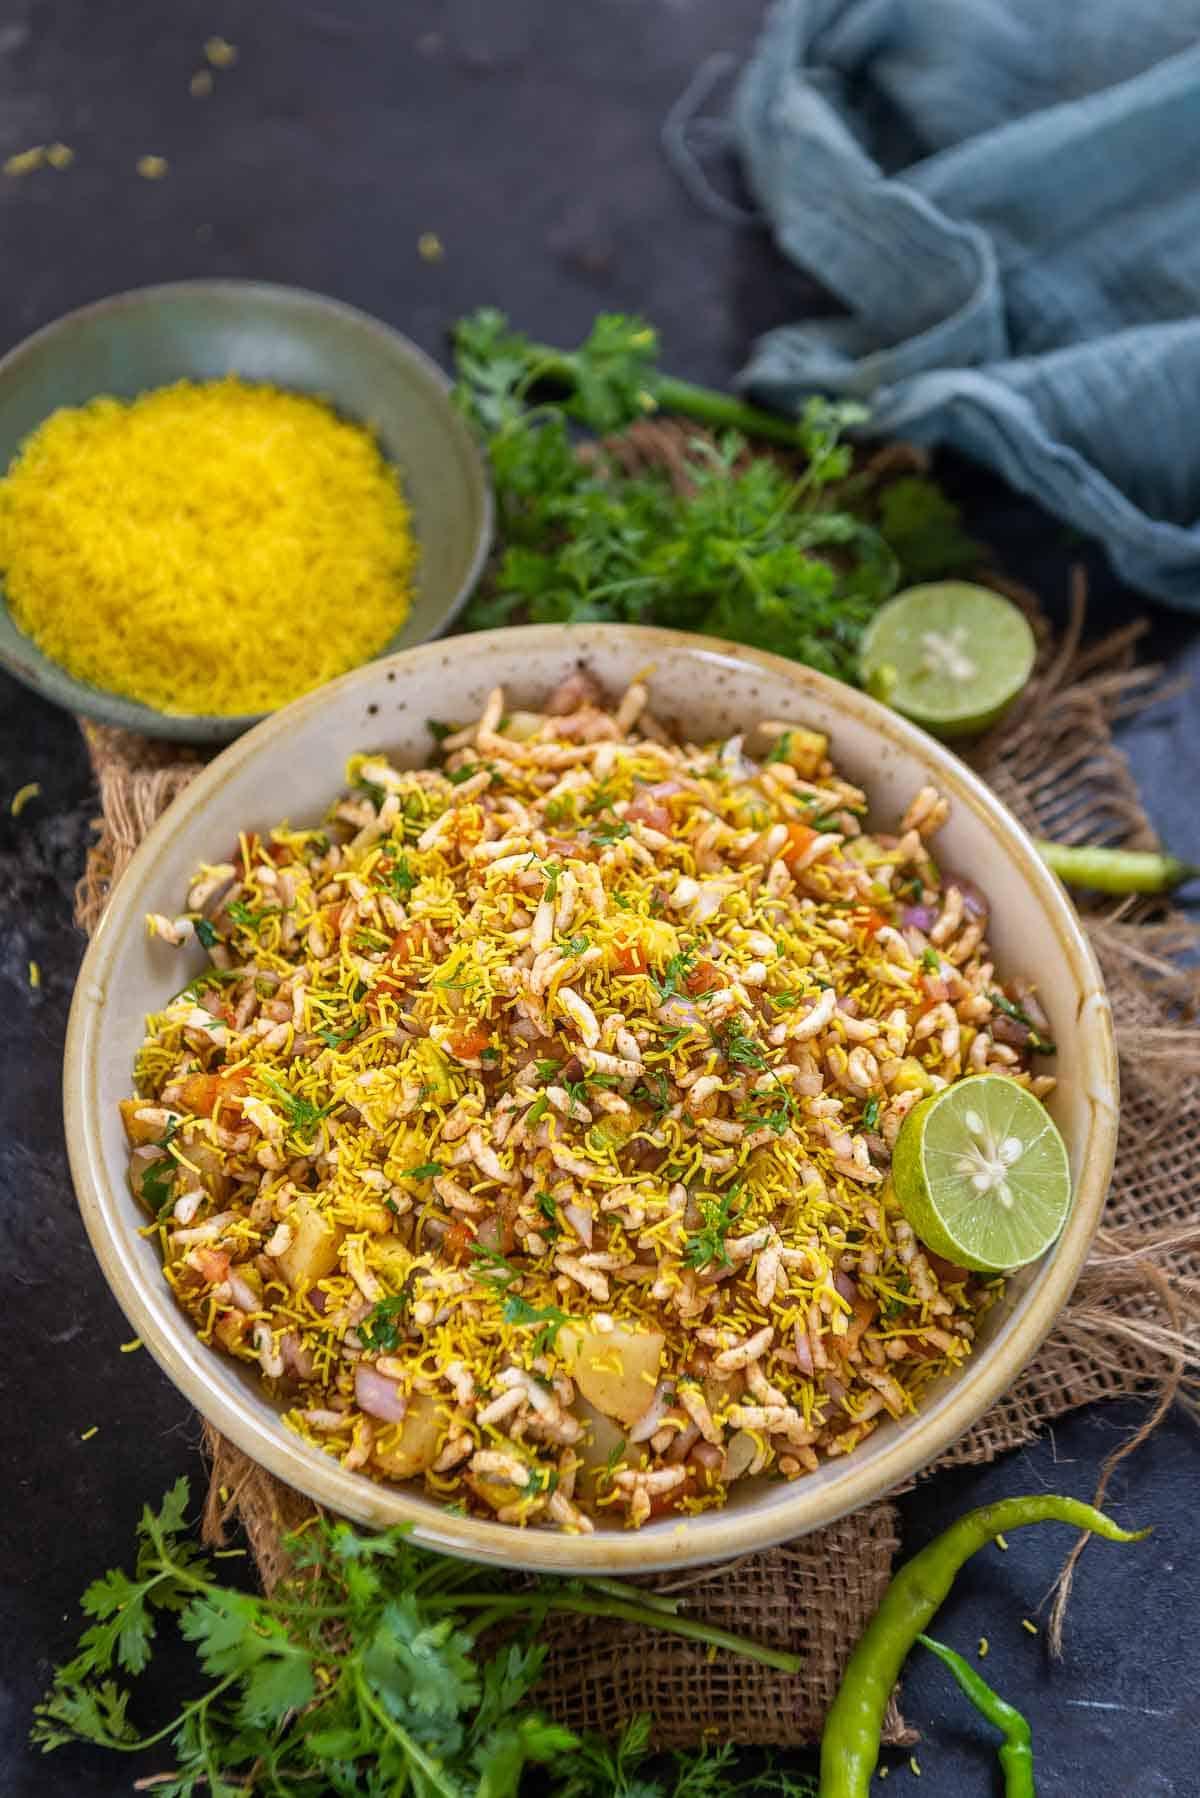 Bhelpuri served in a bowl.